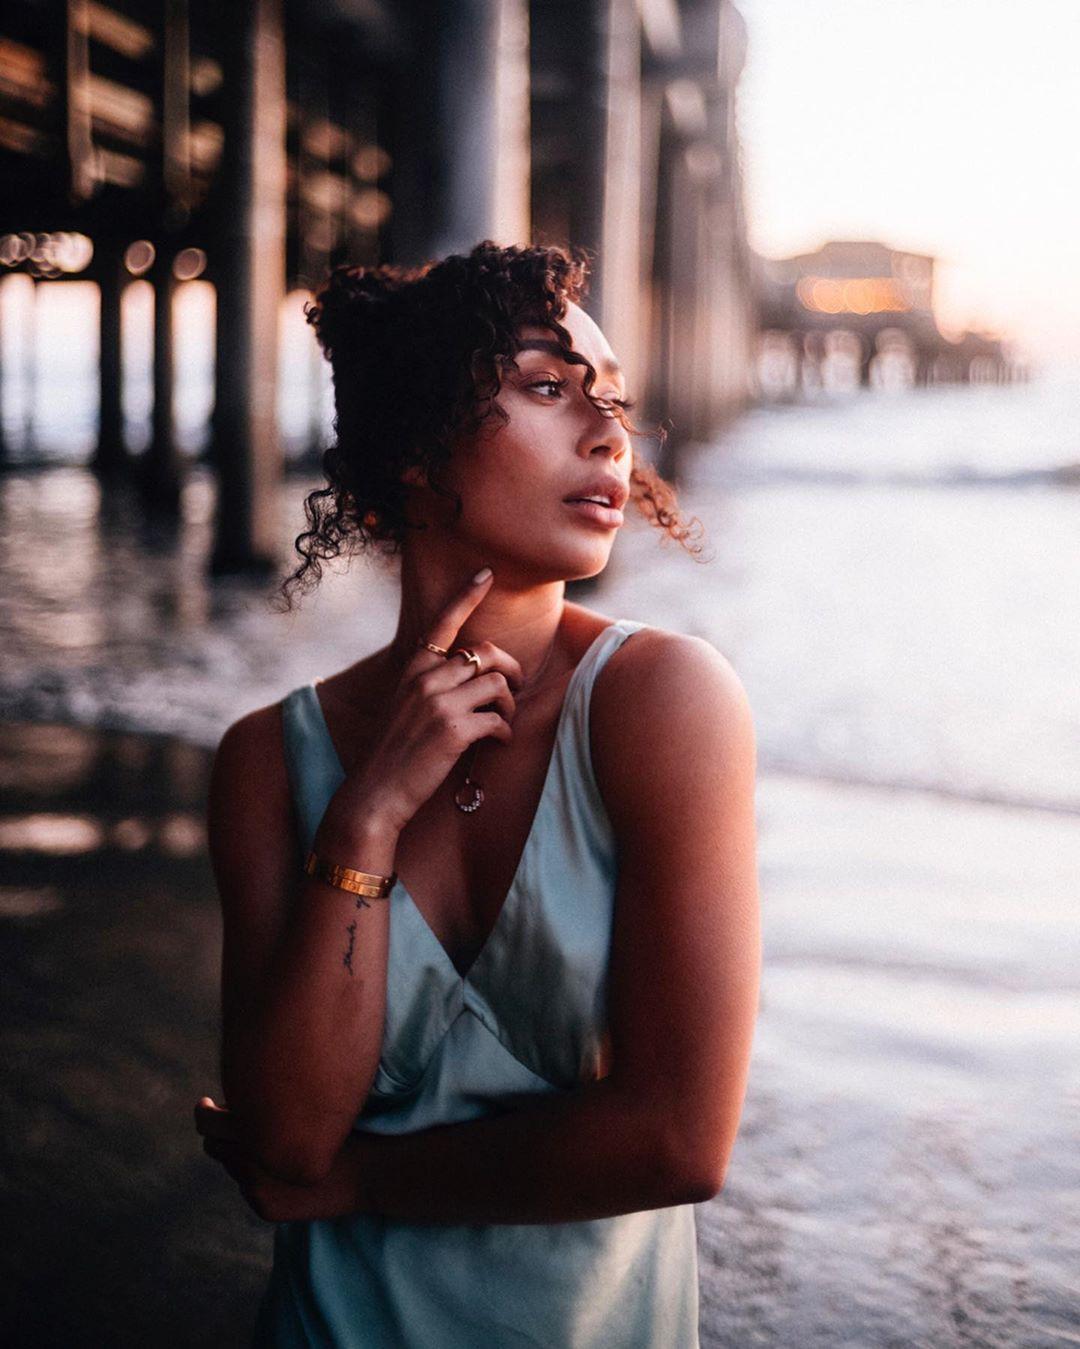 Eva Gutowski hot girls photoshoot, photography for girl, Glossy Lips